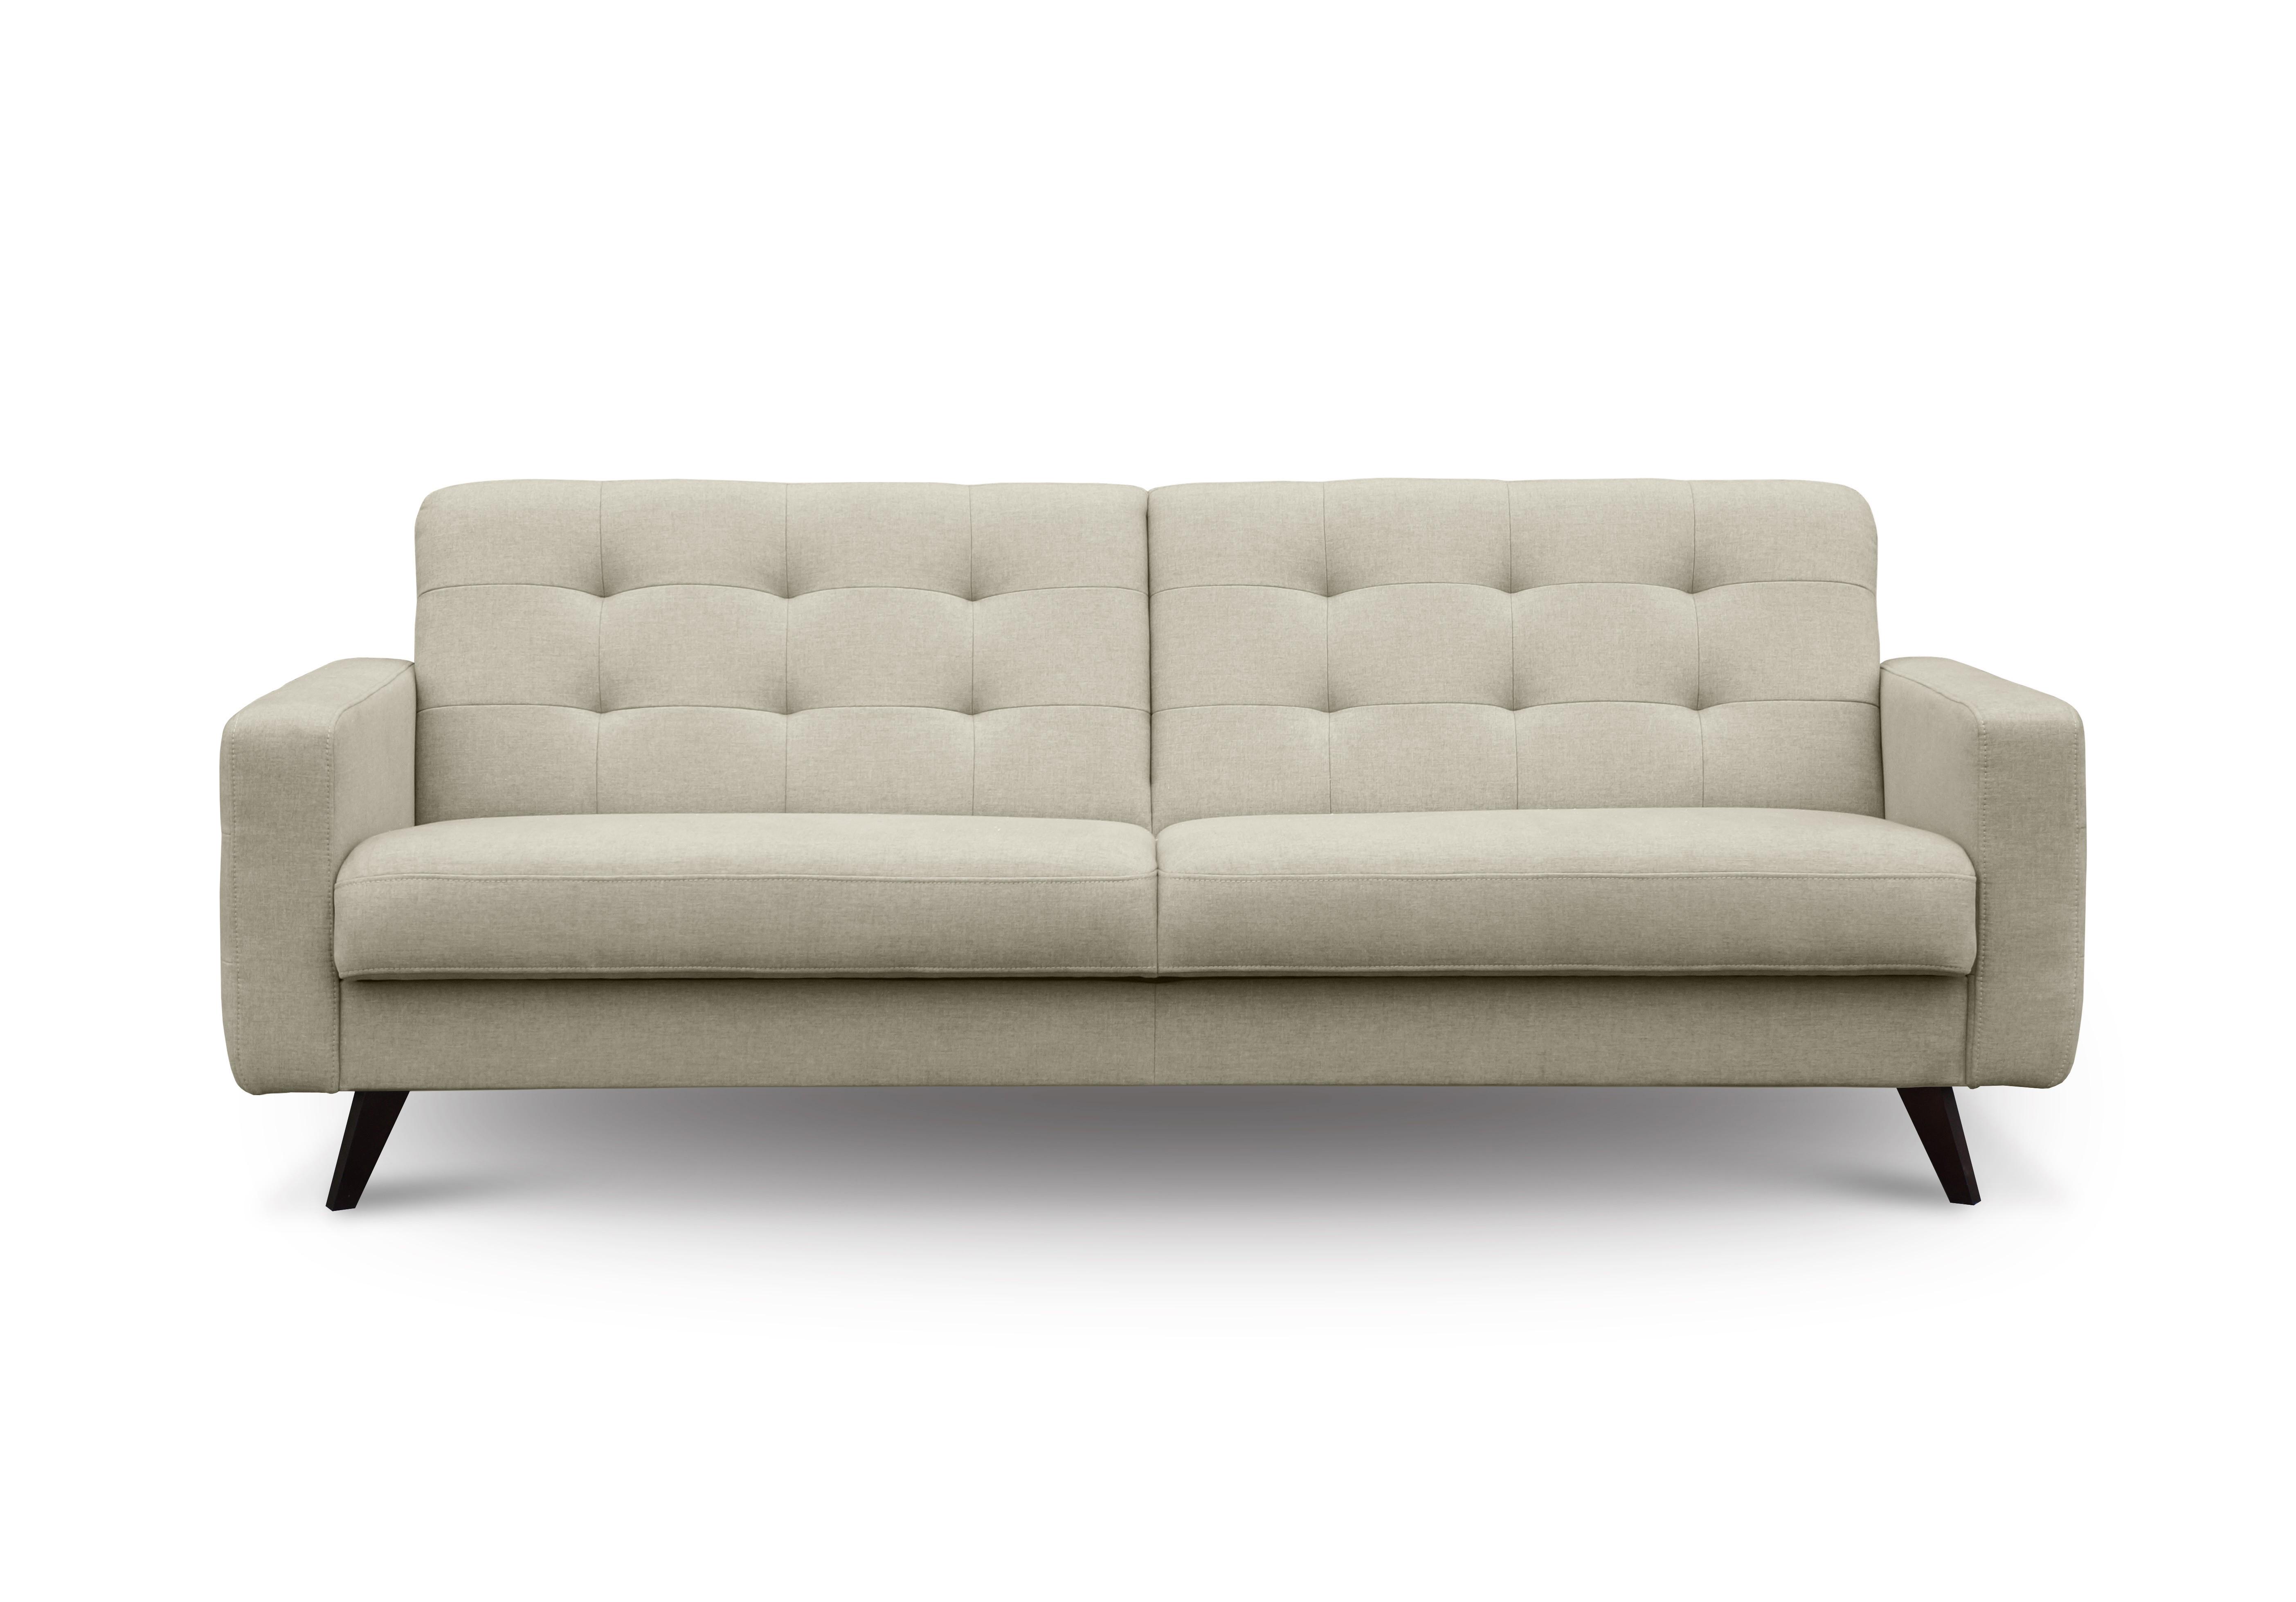 Myfurnish диван-кровать california бежевый  80962/13